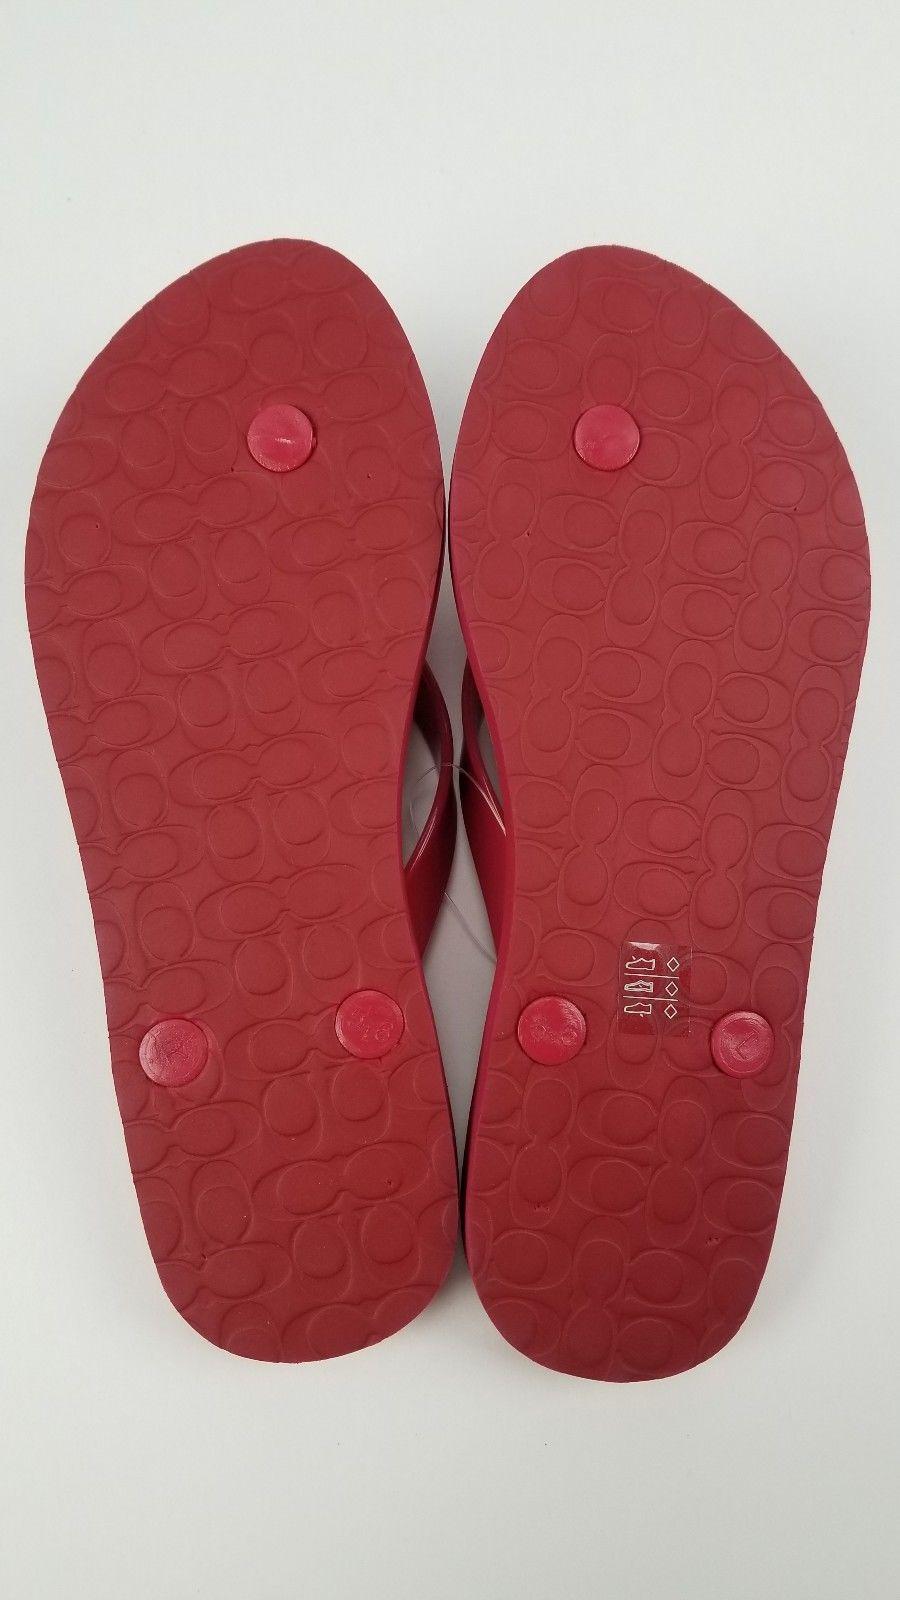 b71539b008fa Womens Coach Red Abigail Floral Rubber Flip Flop Thong Sandal Size 5 New